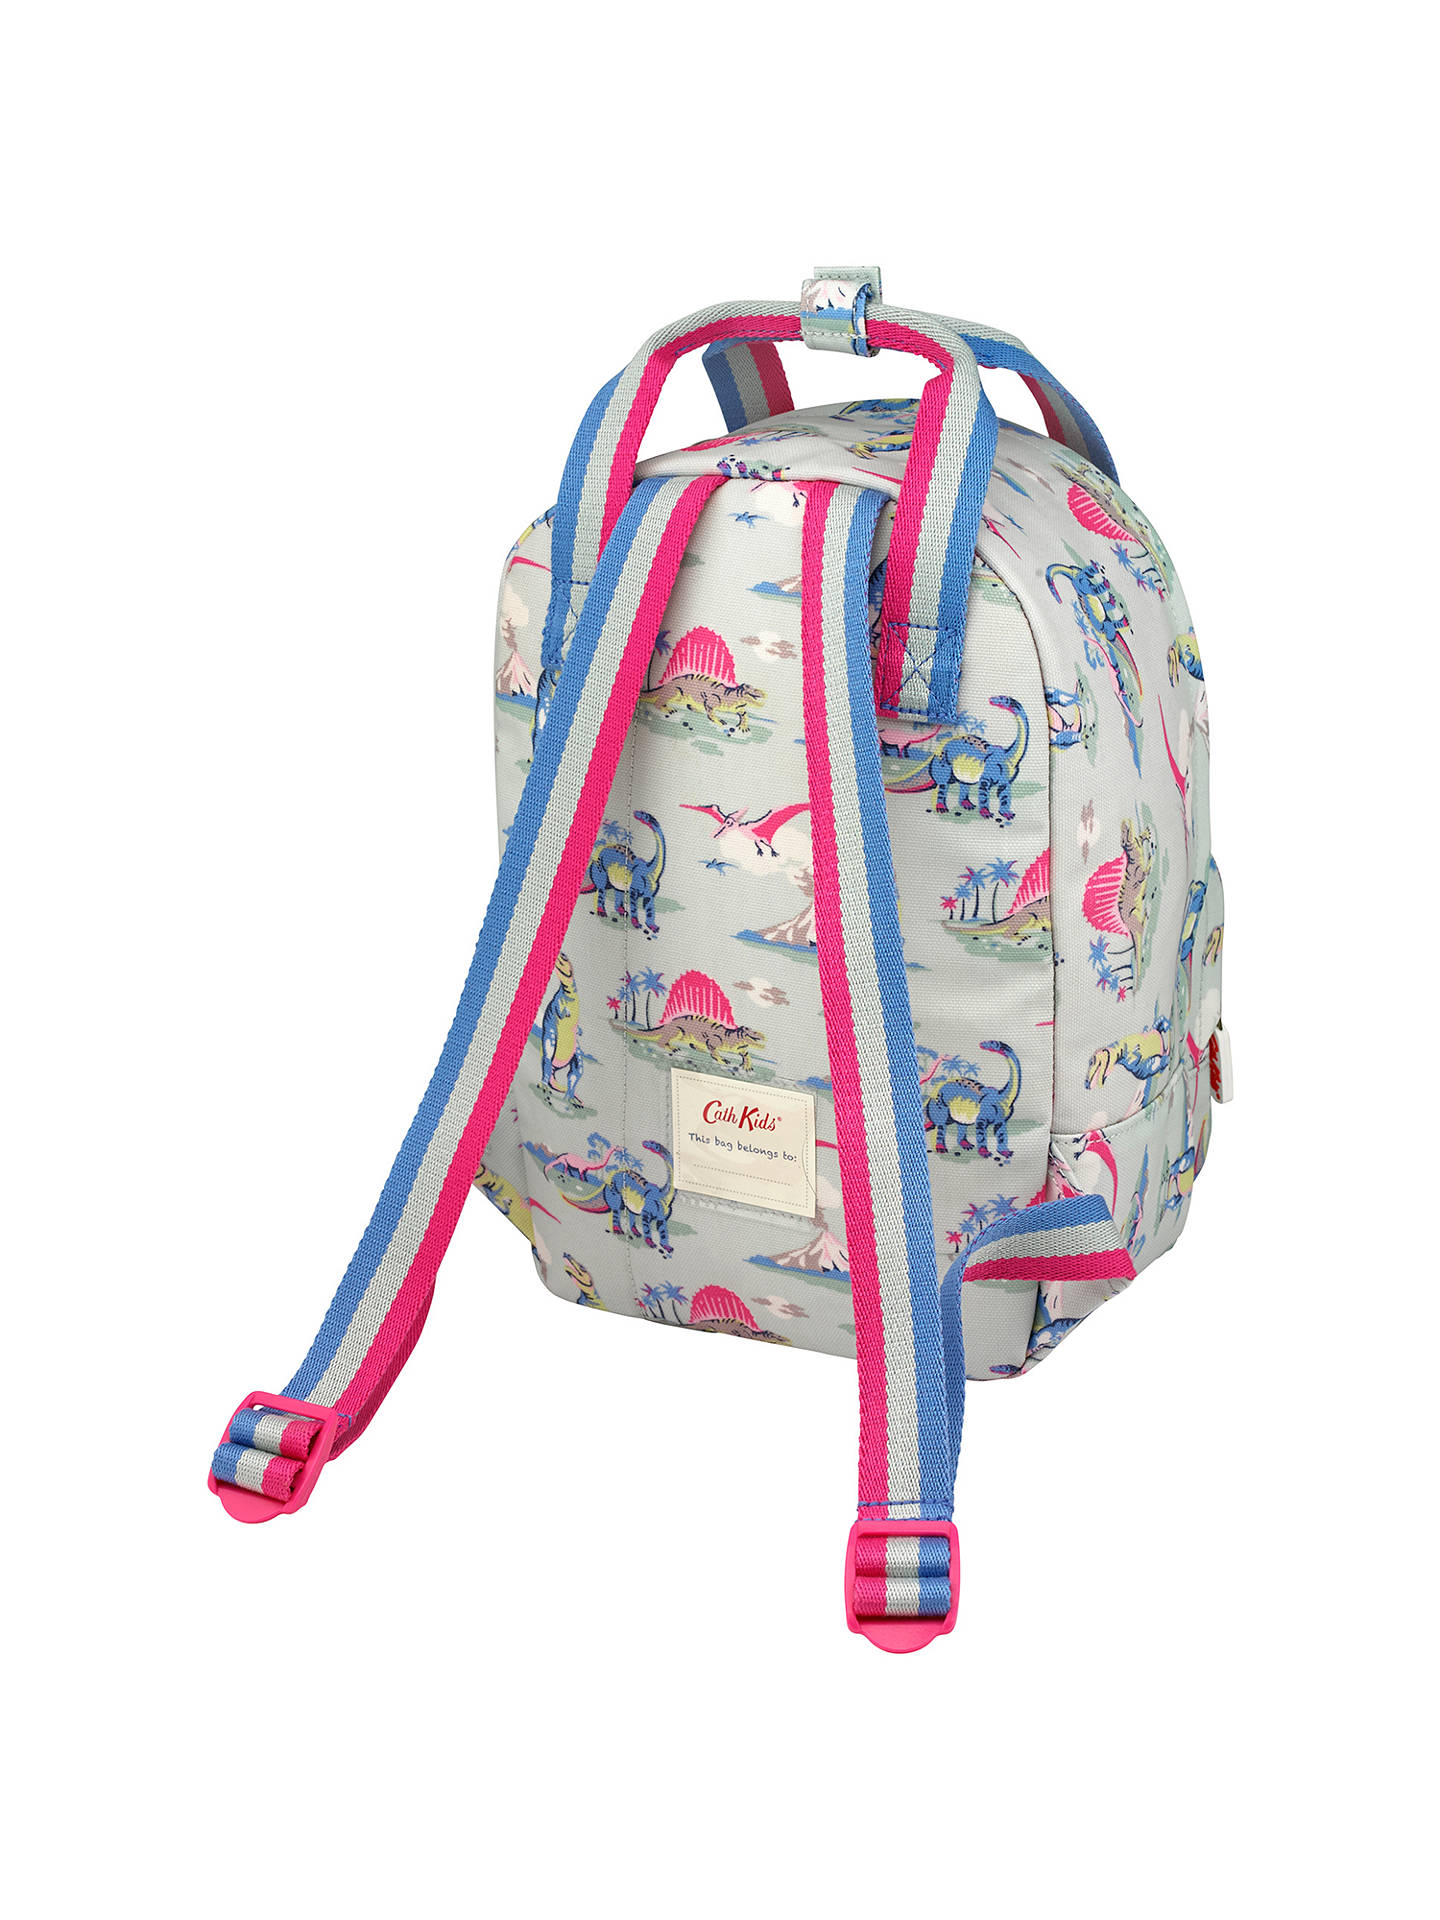 b653404f9ba ... BuyCath Kidston Children s Dinosaur Print Medium Backpack, Blue Pink  Online at johnlewis. ...